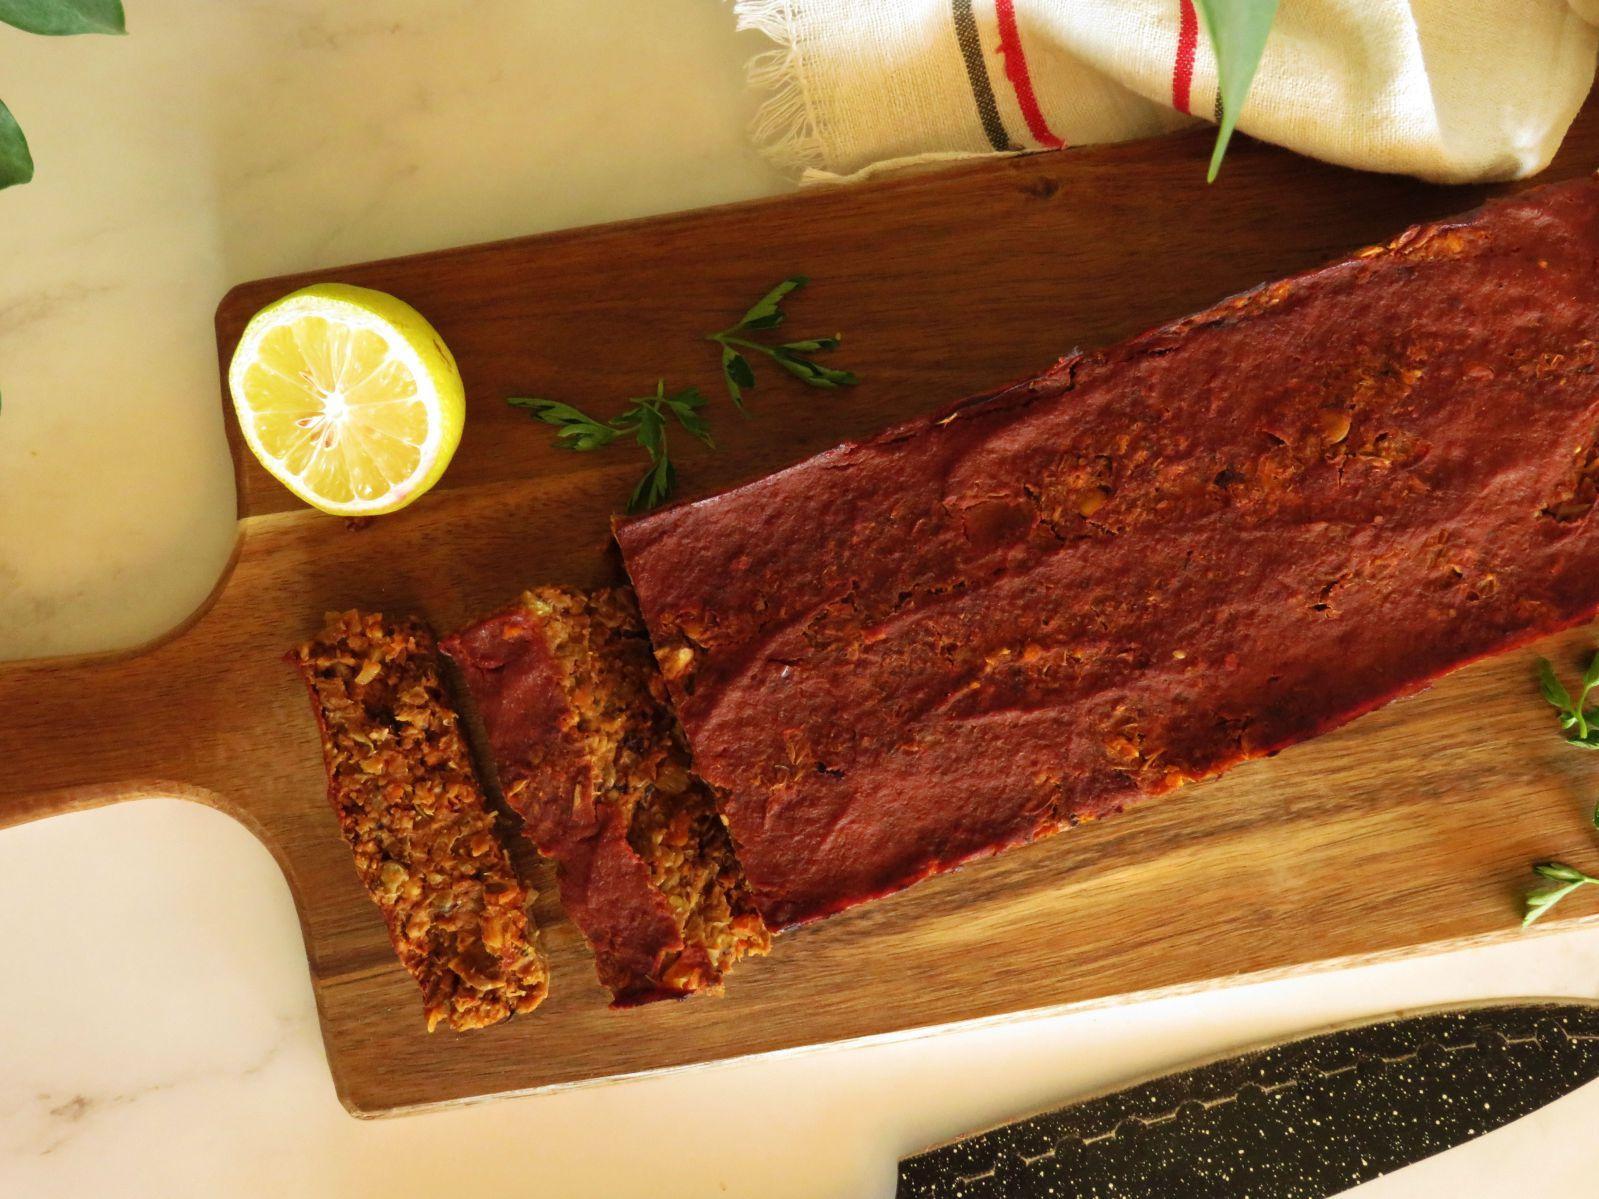 Vegan Lentil Loaf Recipe with Tomato Glaze